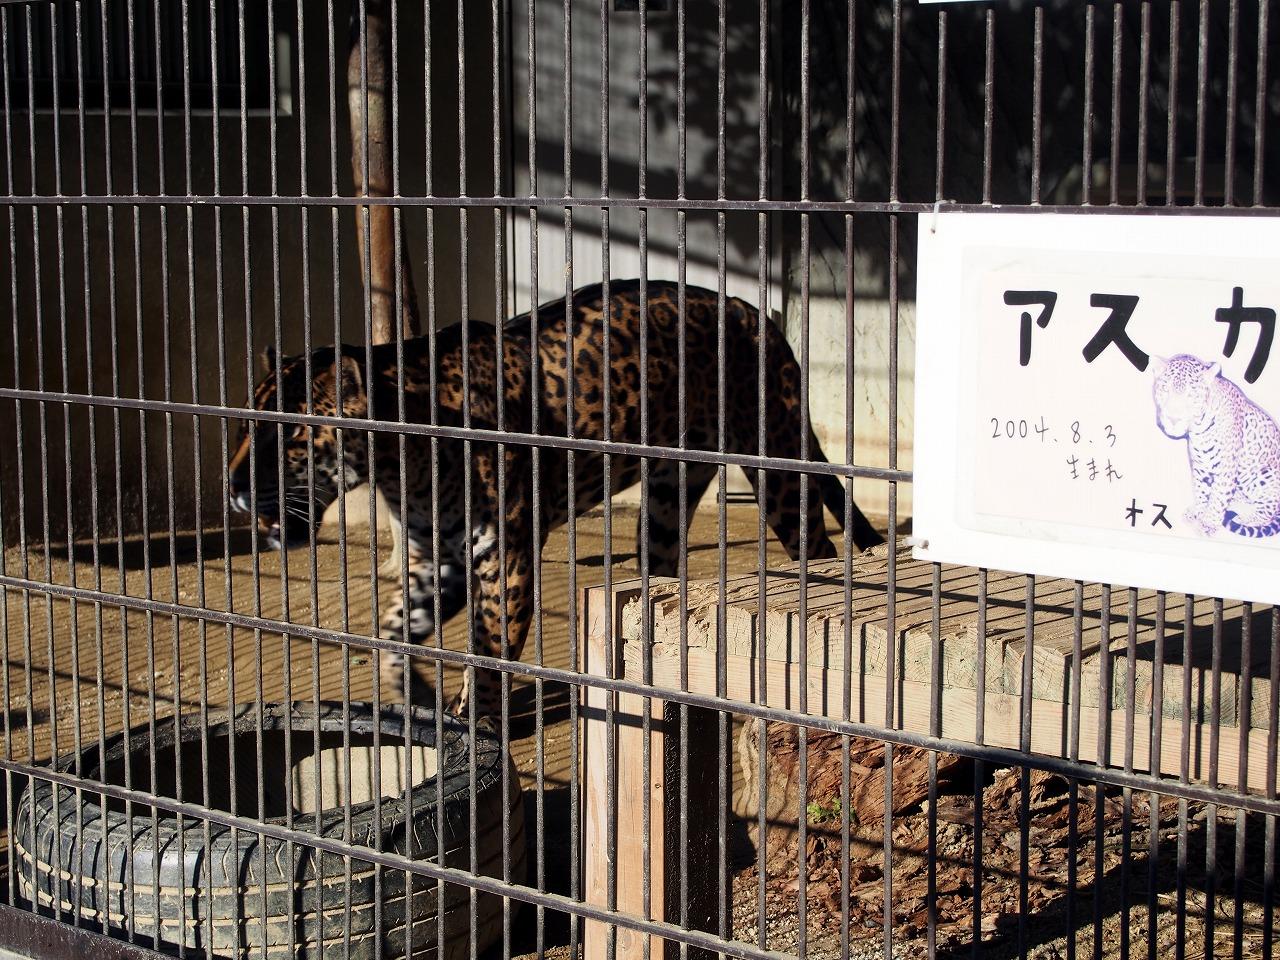 Zoo24_20141115.jpg